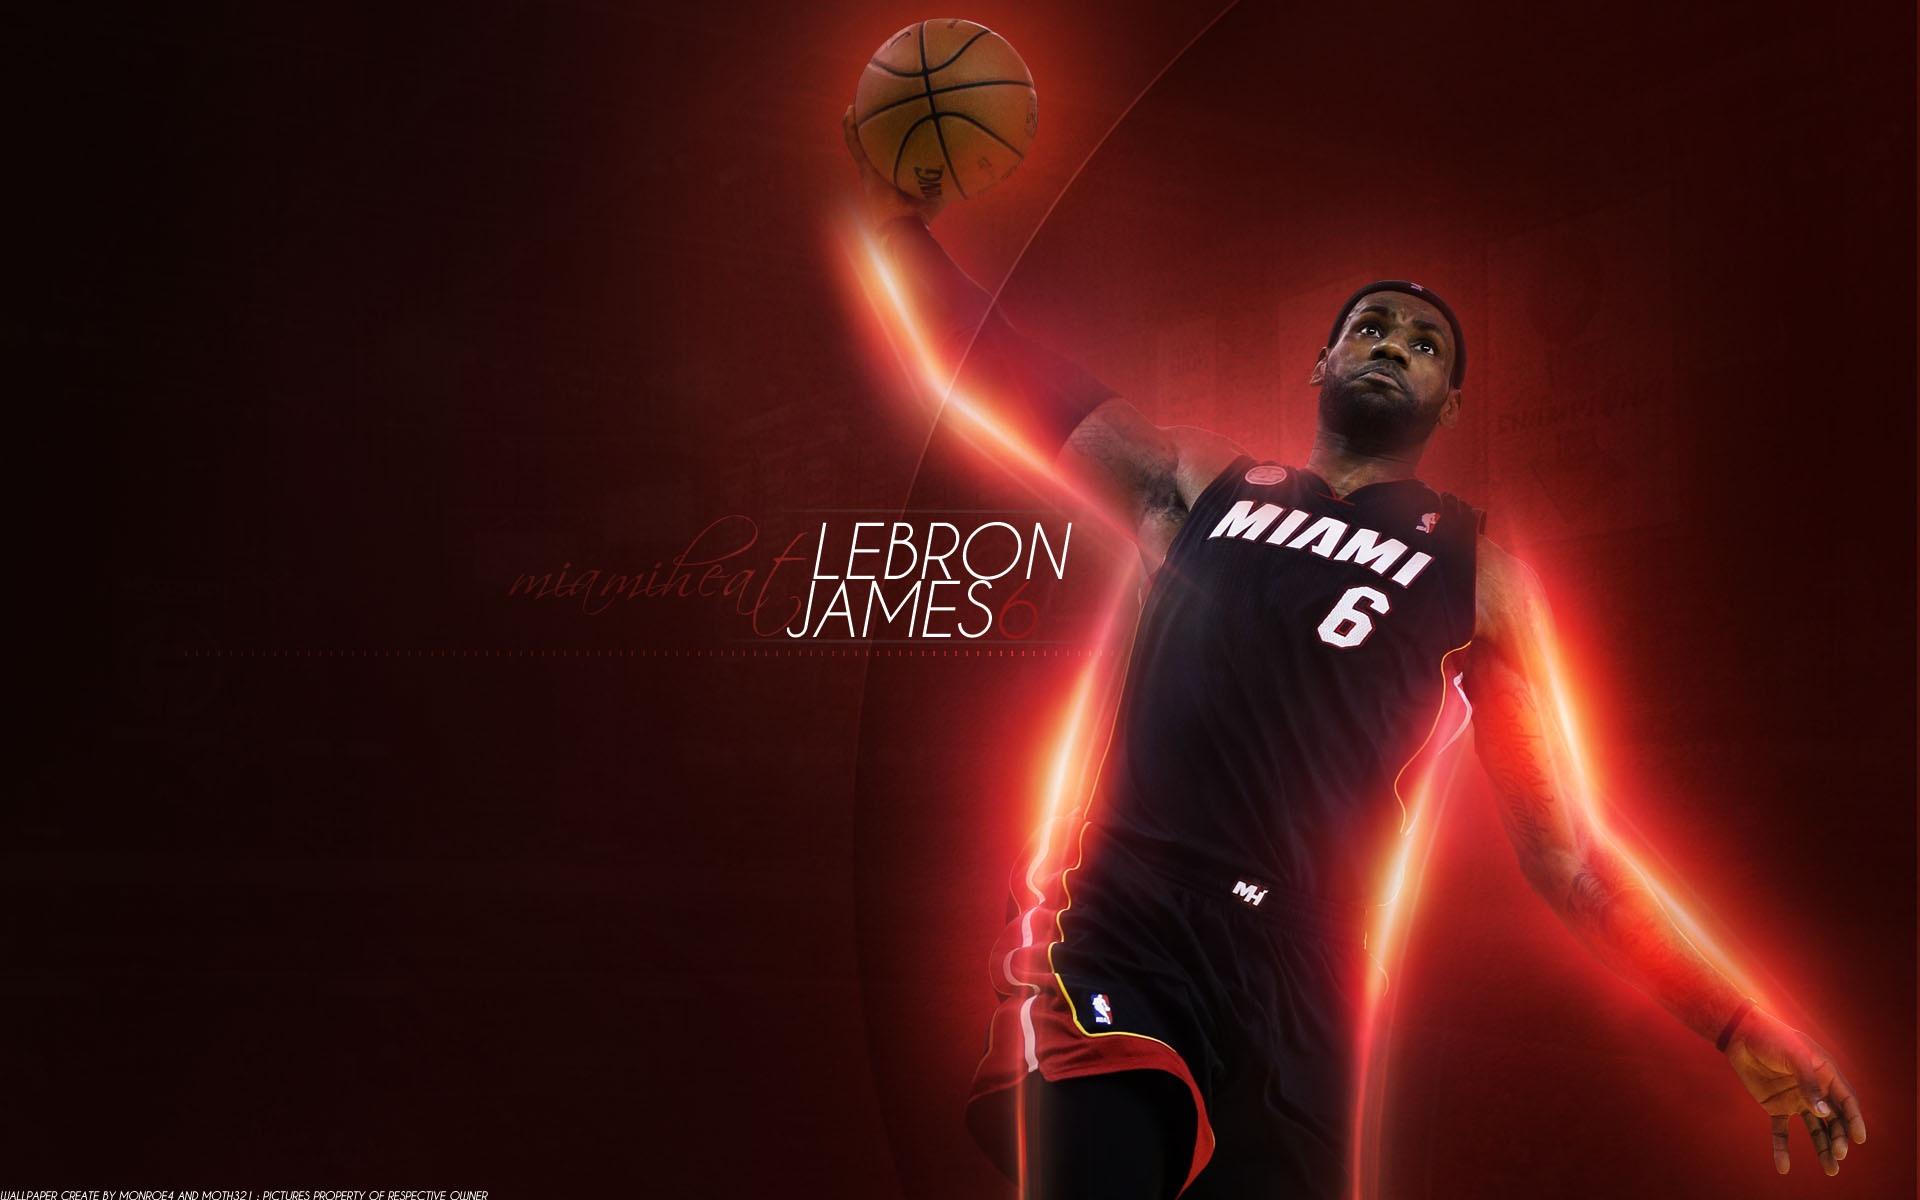 LeBron James Wallpaper 1